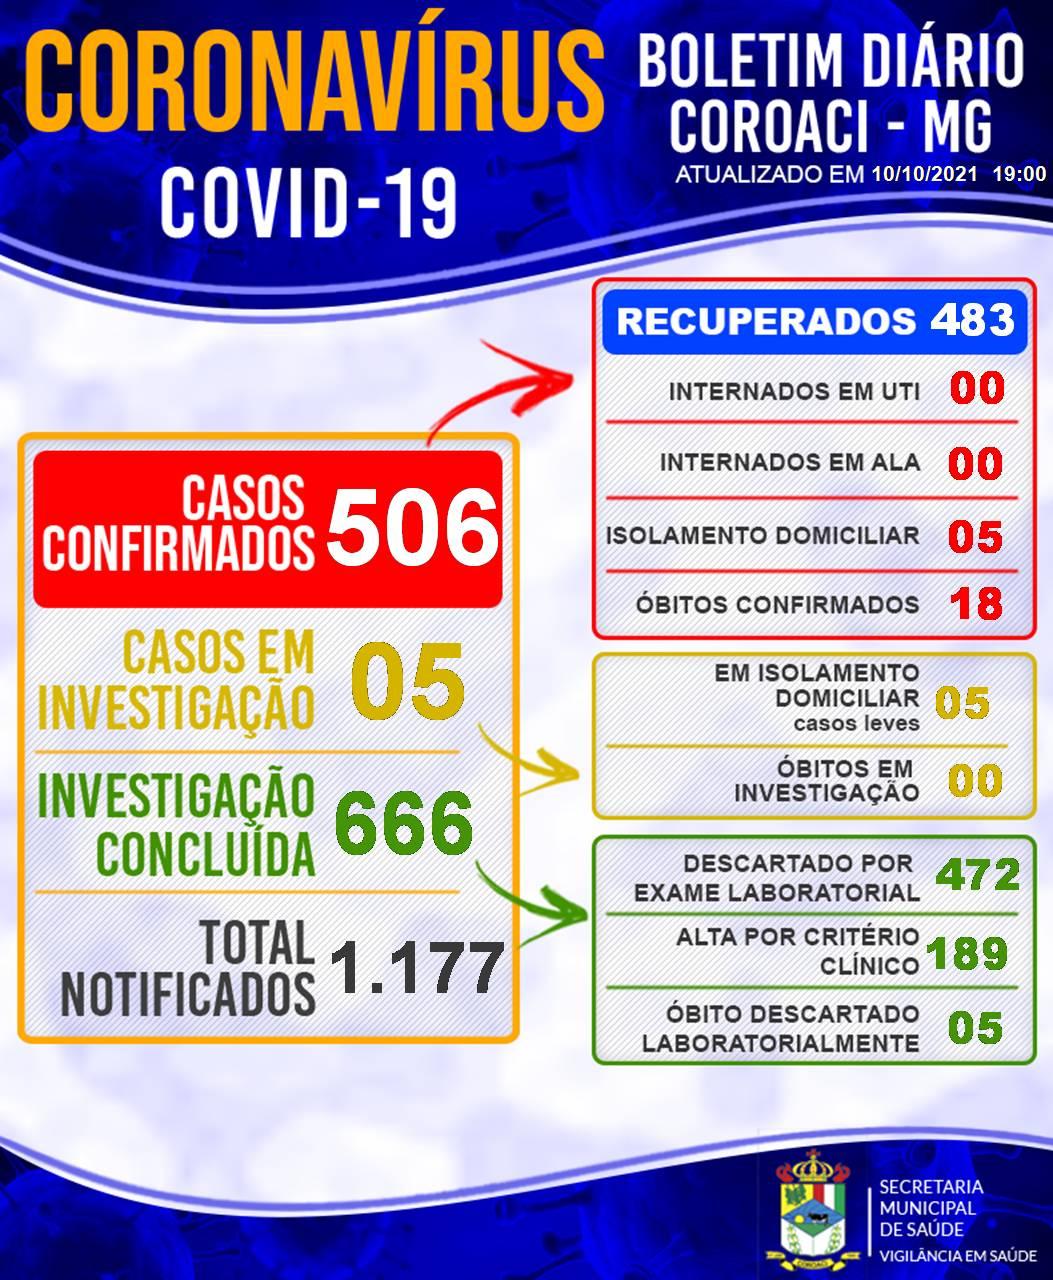 BOLETIM INFORMATIVO OFICIAL SOBRE O CORONAVÍRUS 10/1...